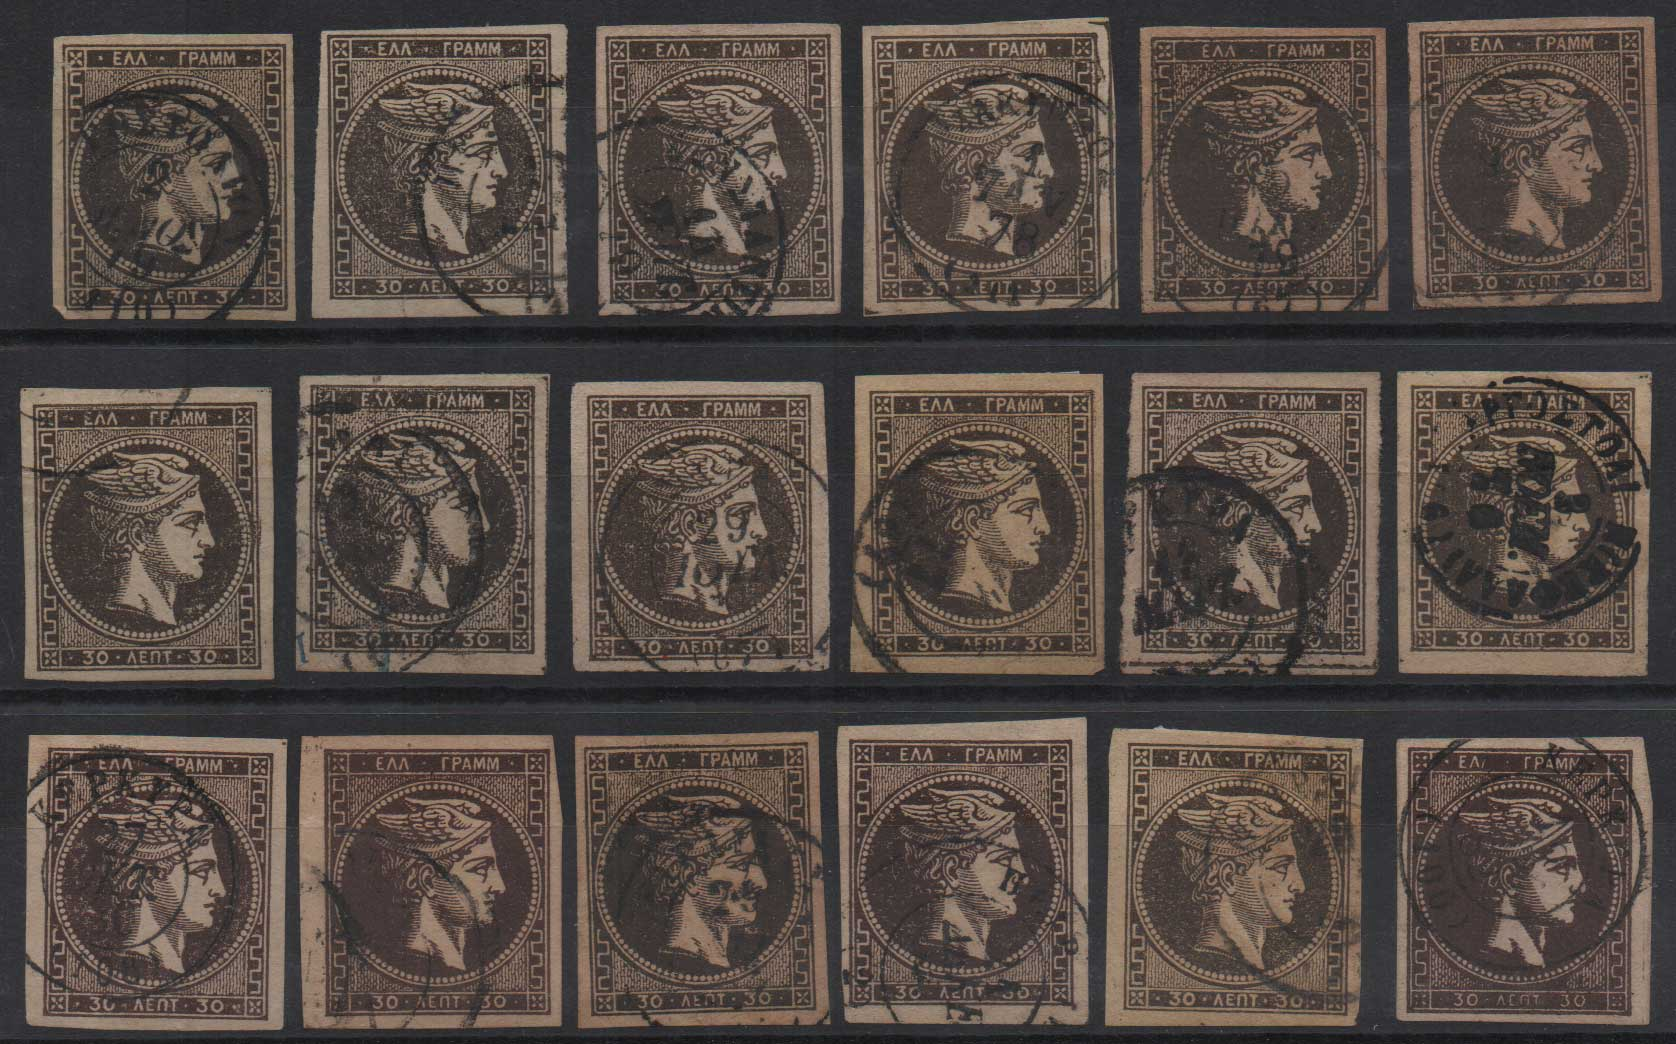 Lot 17 - large hermes head large hermes head -  Athens Auctions Public Auction 72 General Stamp Sale